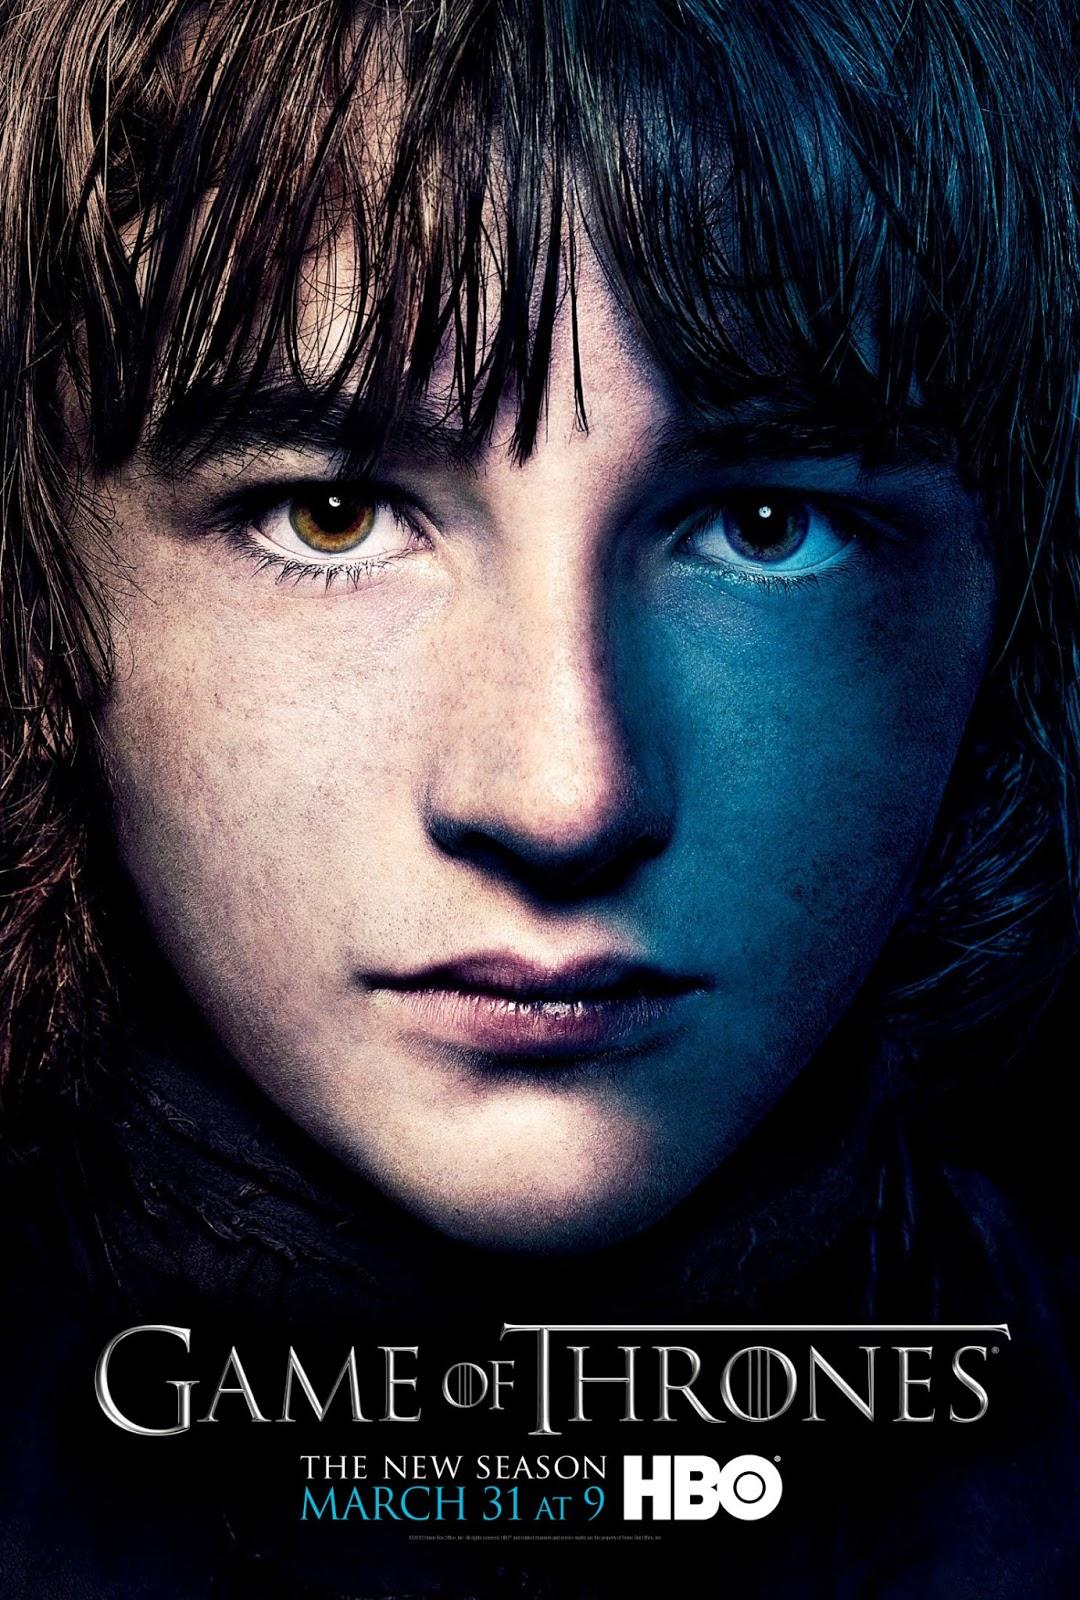 The Inside Trekker: Game of Thrones Season 3 Gets Gloomy ...